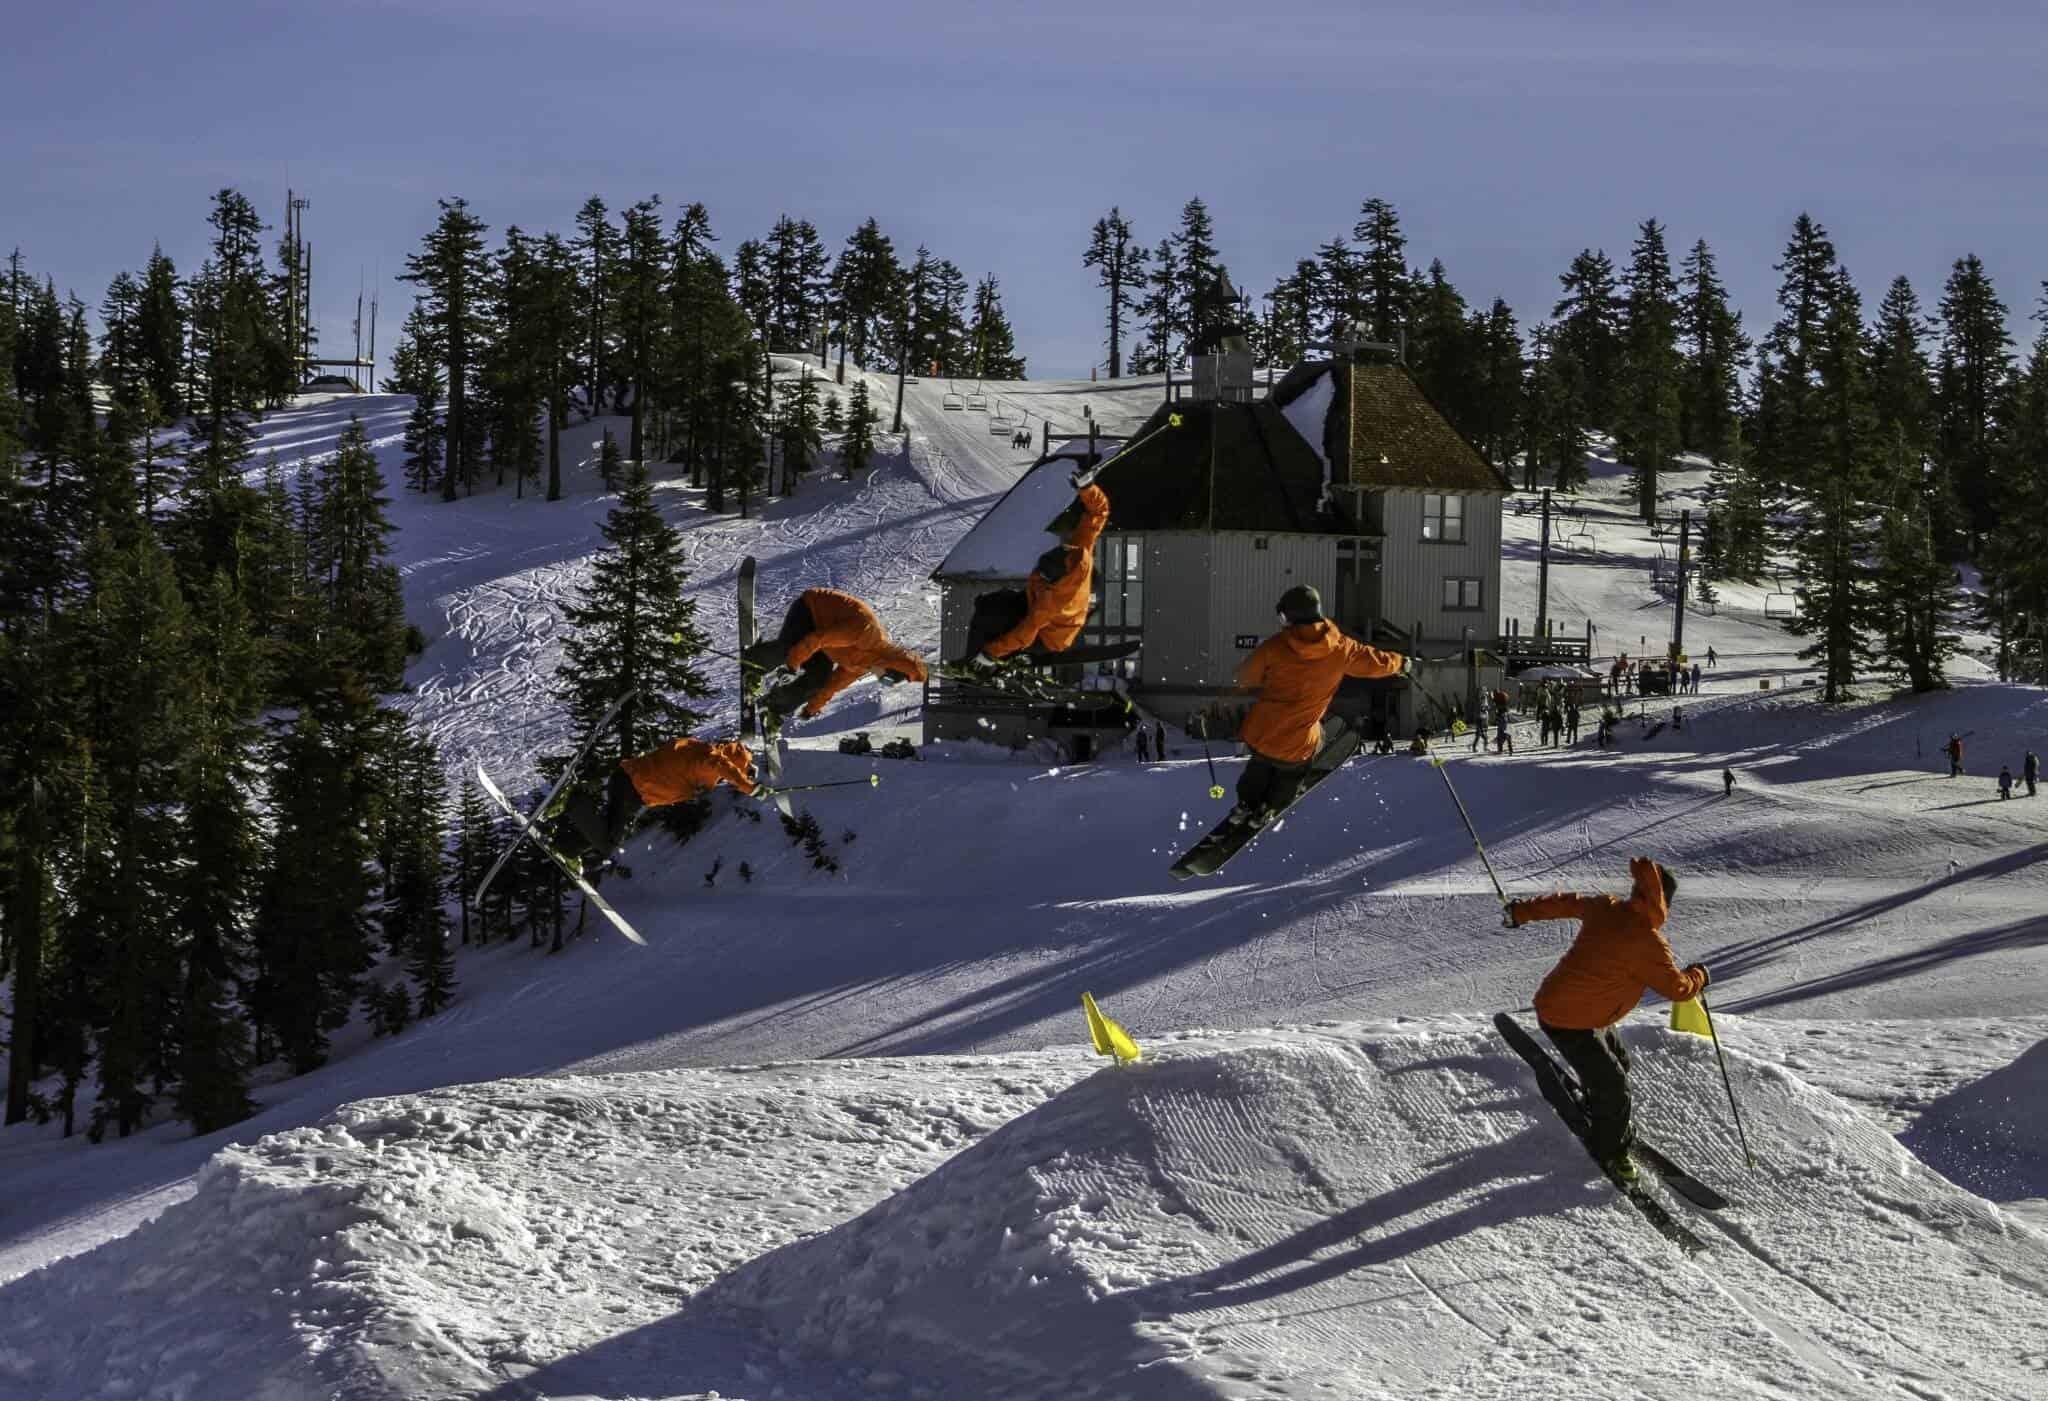 Pep Fujas enjoys skiing in Mt. Ashland's Terrain Park